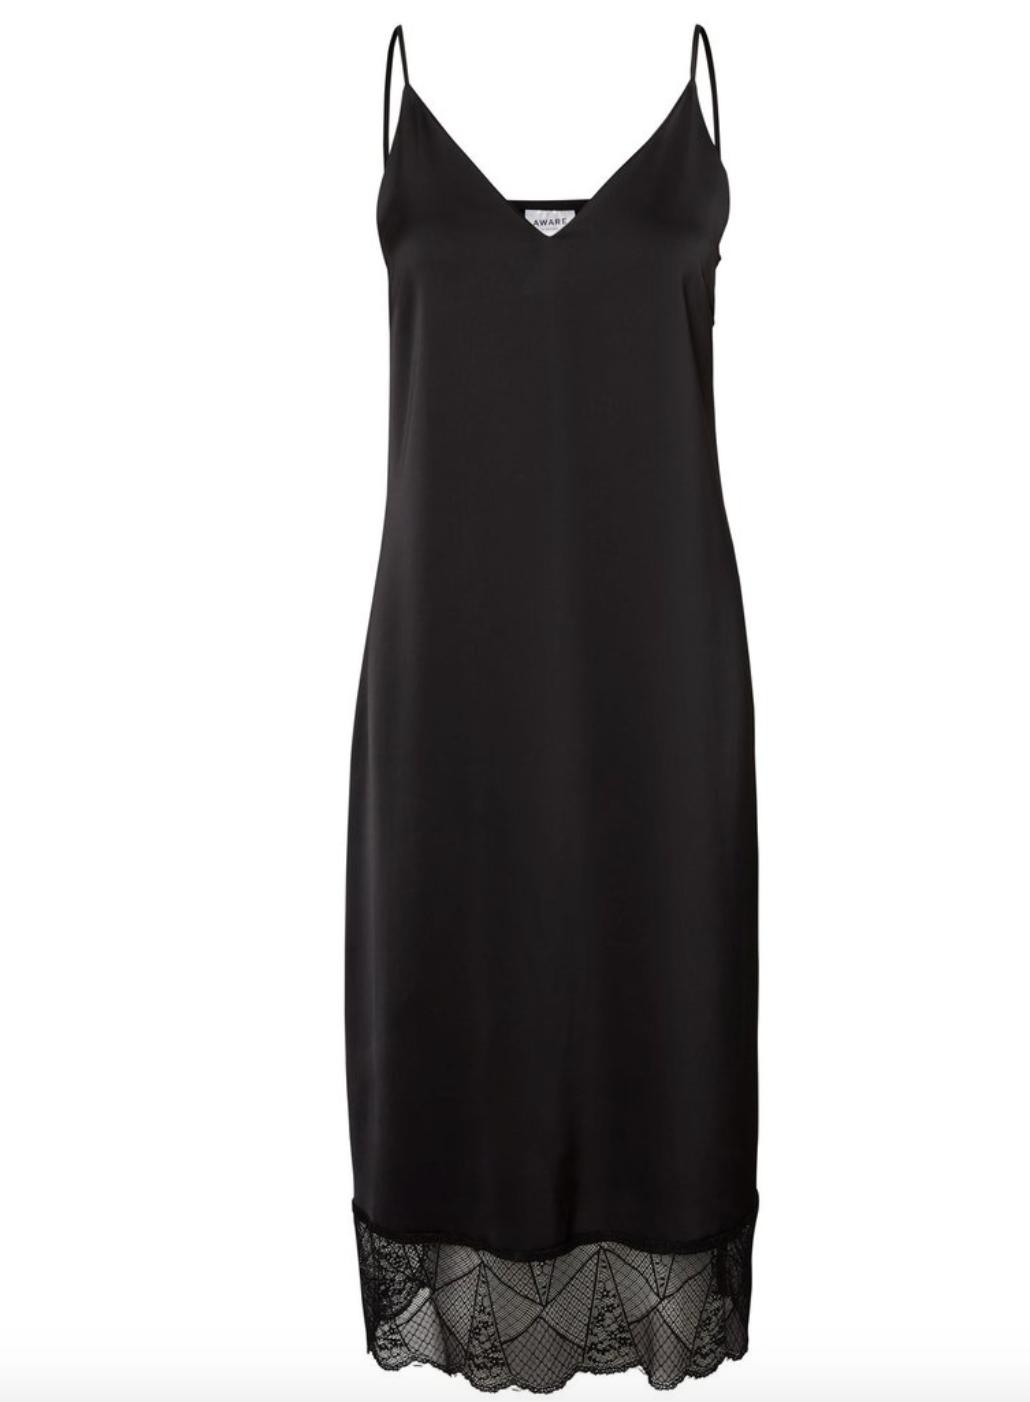 Vero Moda Black Slip Dress - Born at Dawn